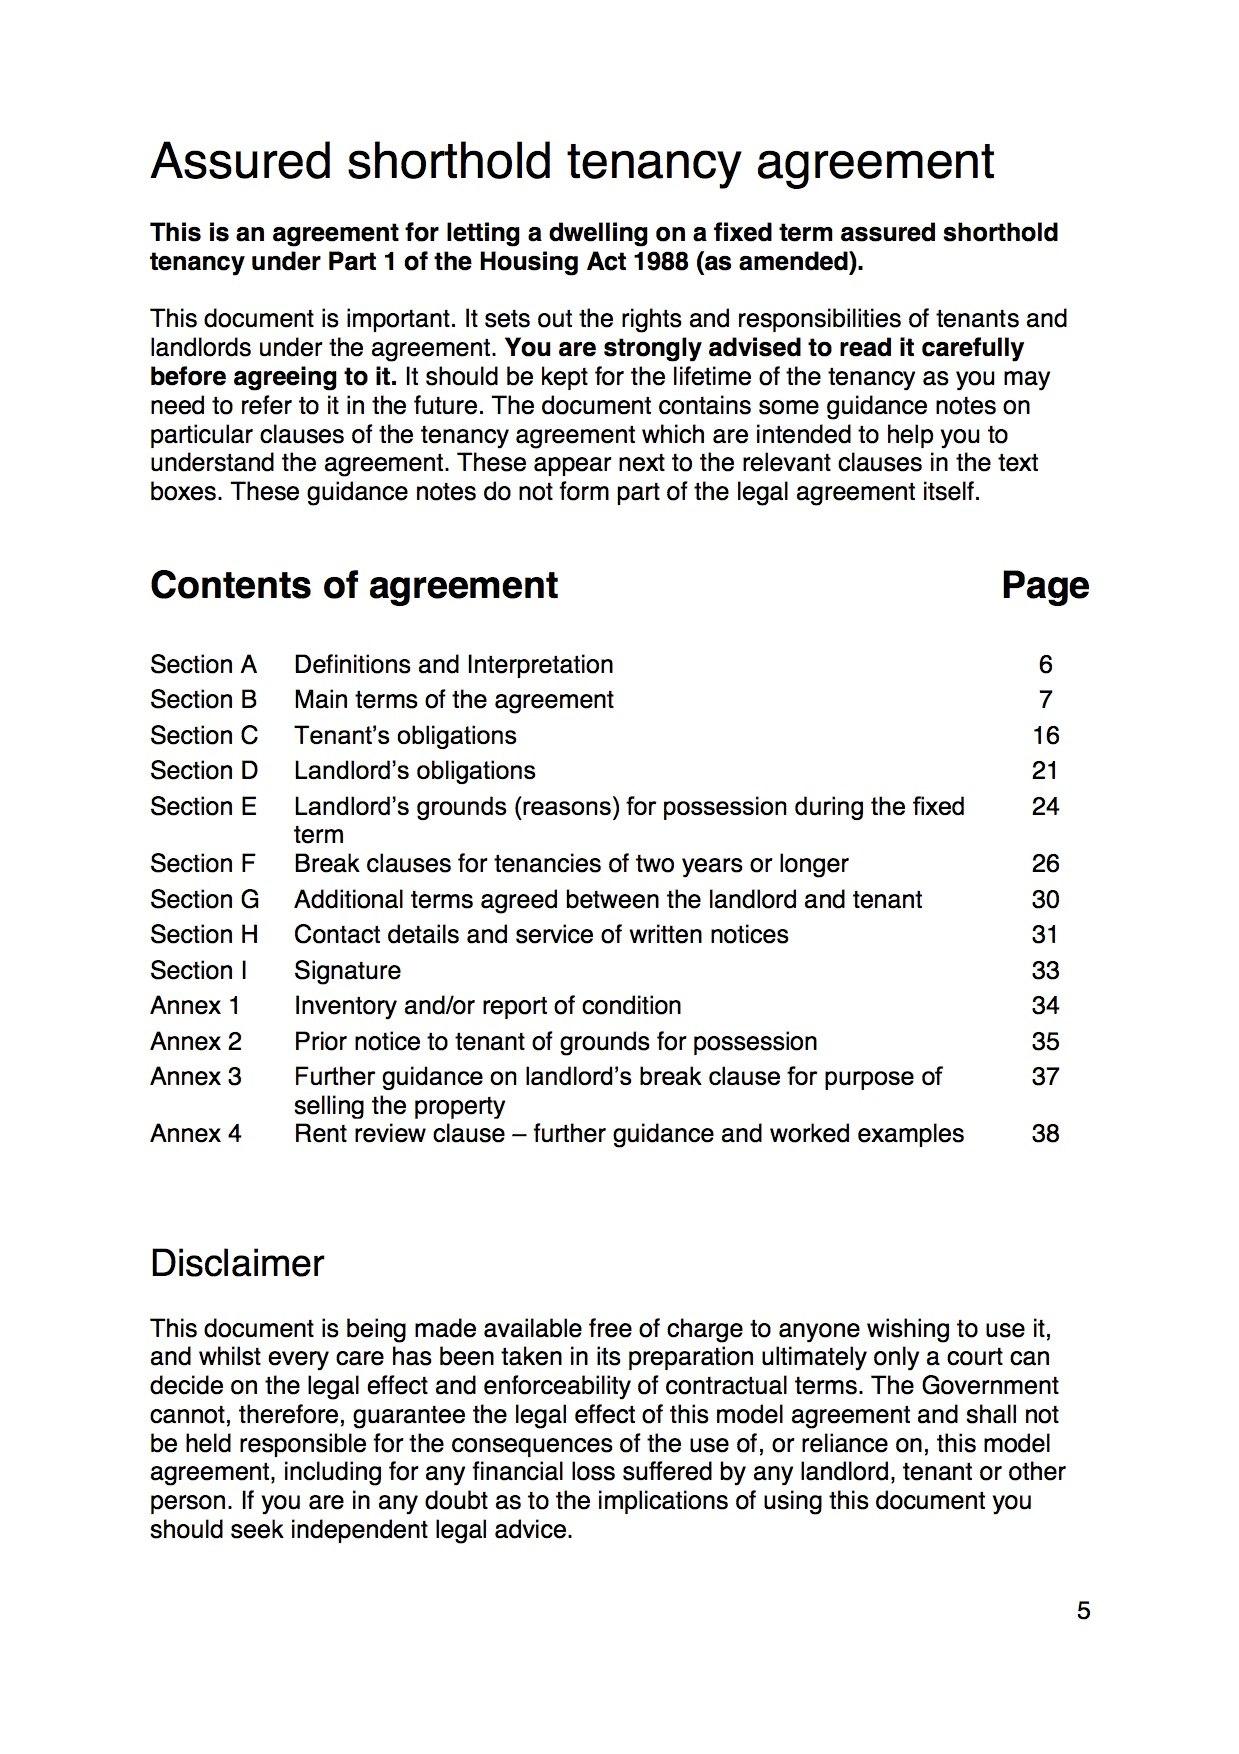 Assured Shorthold Tenancy Agreements Explained  Plumbers London Pertaining To Assured Shorthold Tenancy Agreement Template